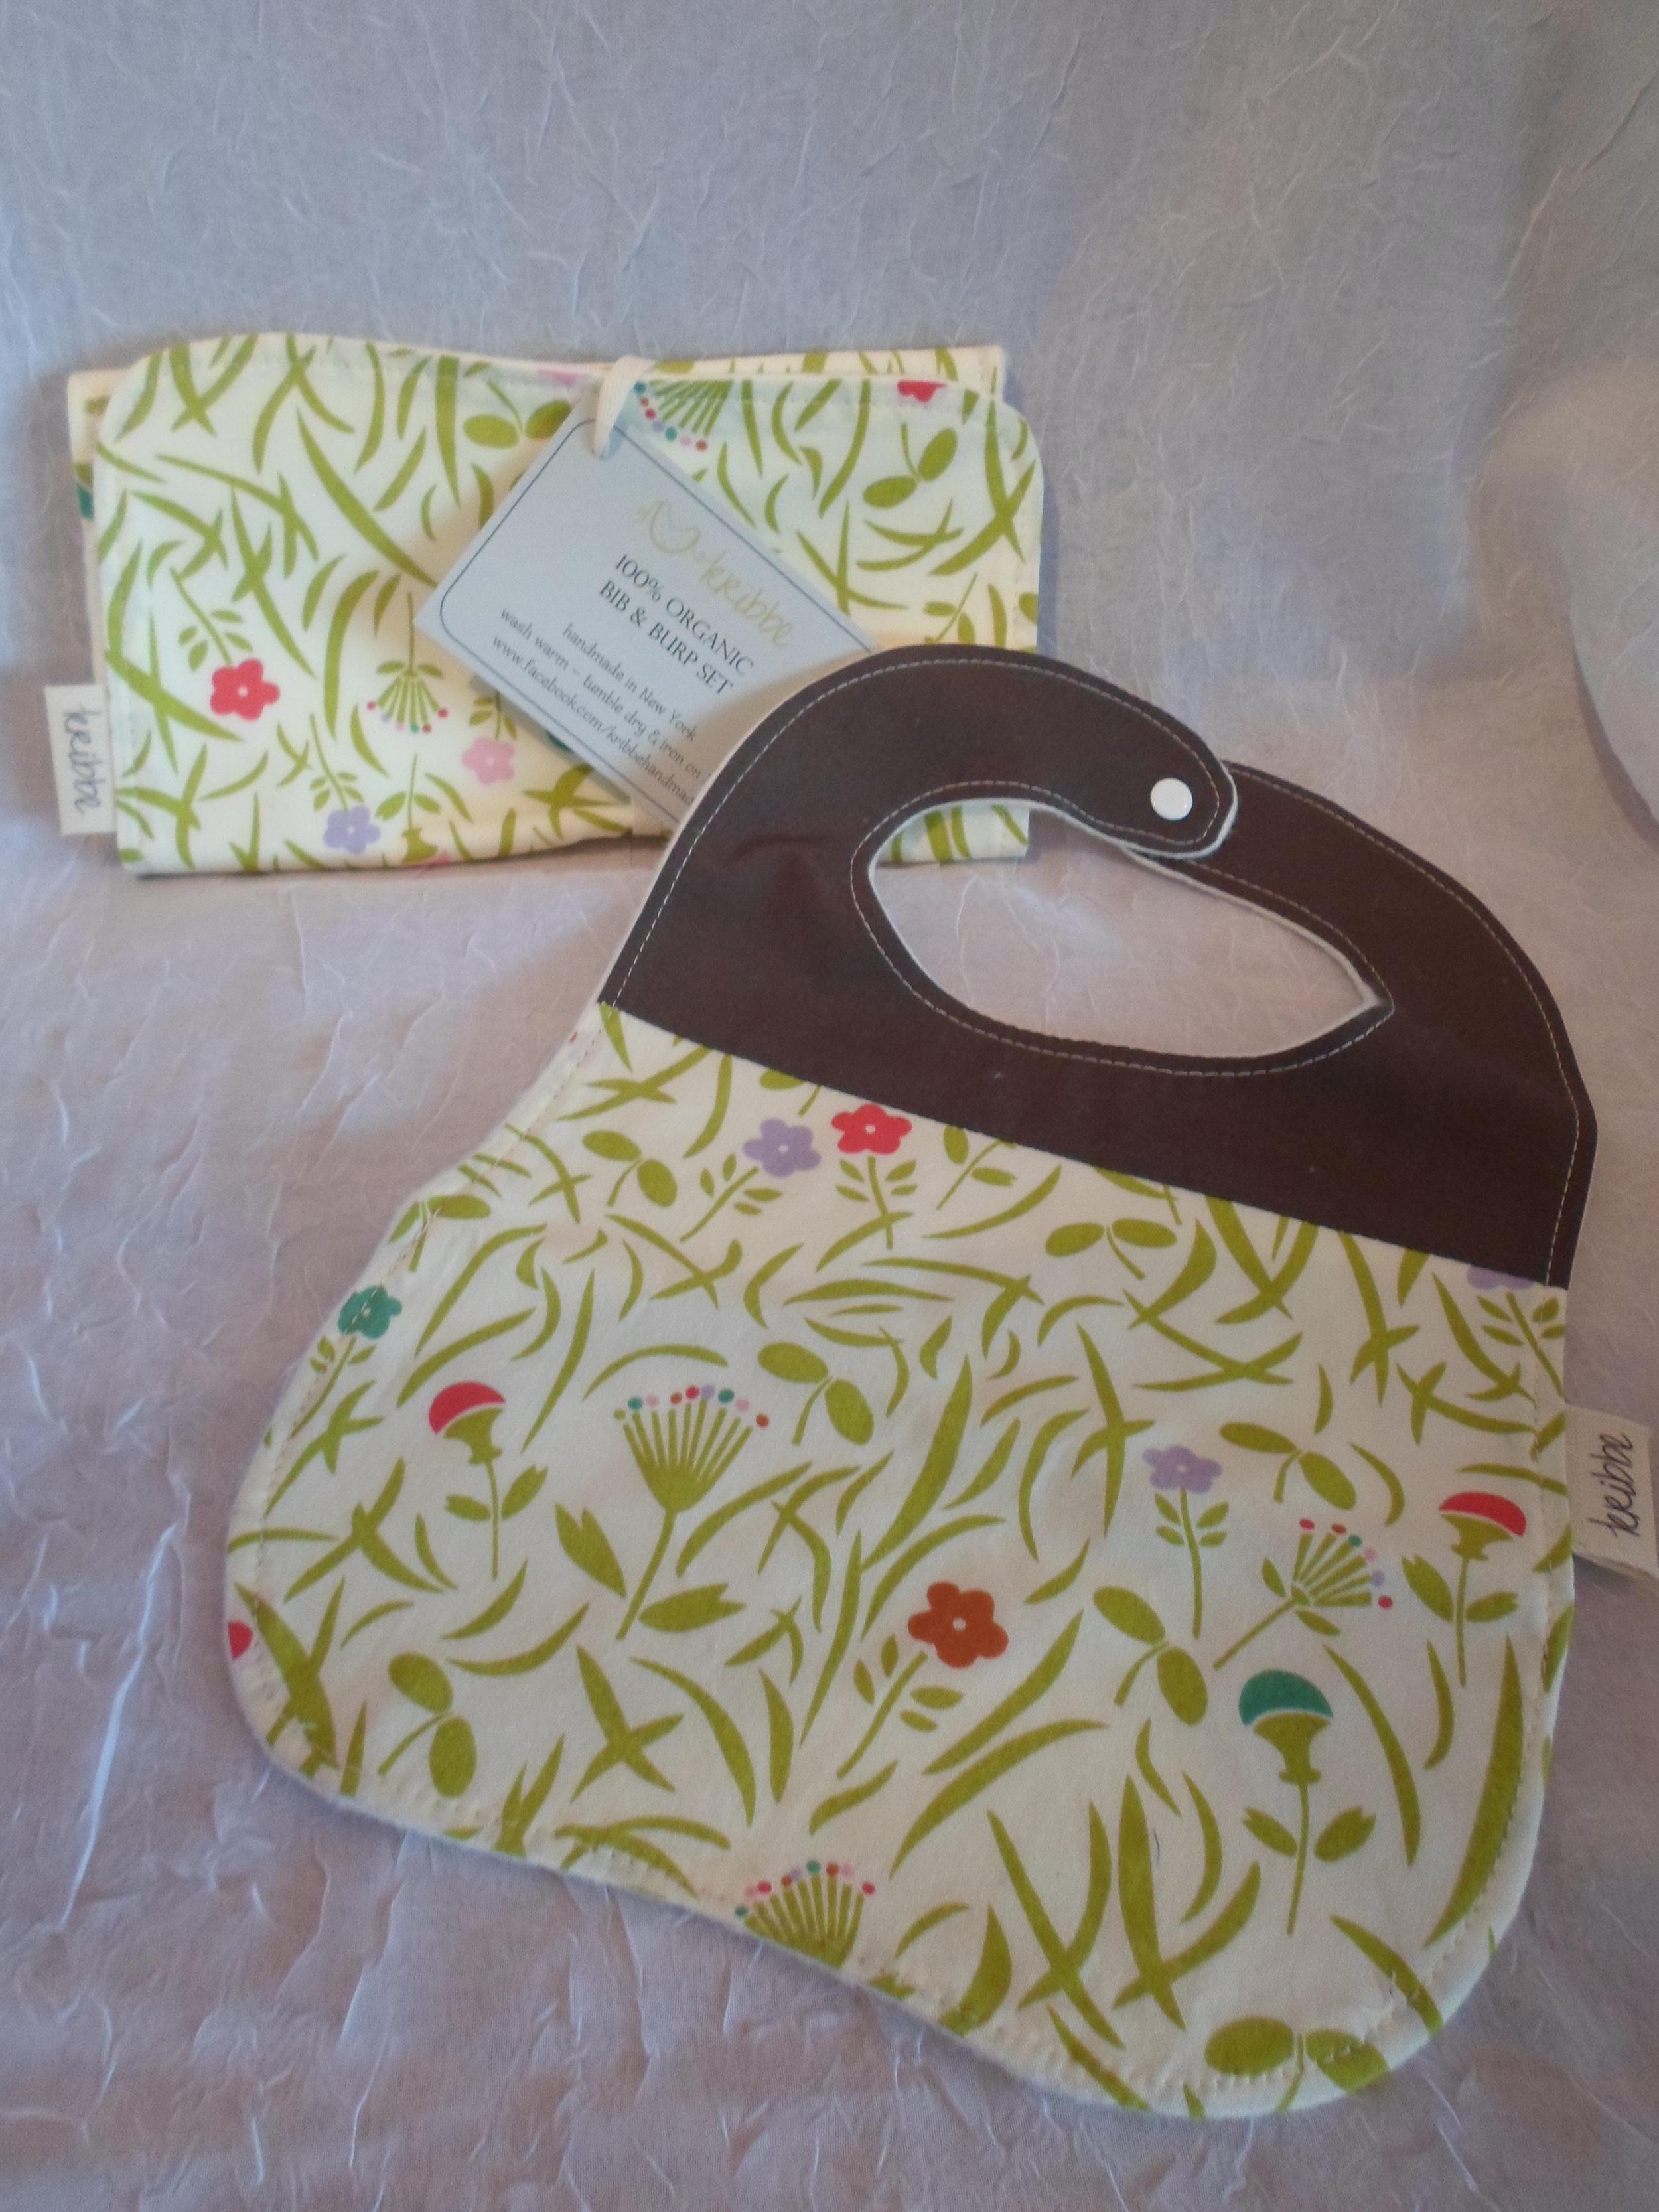 Kribbe Organic Cotton Bib & Burp set (your choice fabric)  Locally Handmade   $27.00    Wants 1 PURCHASED